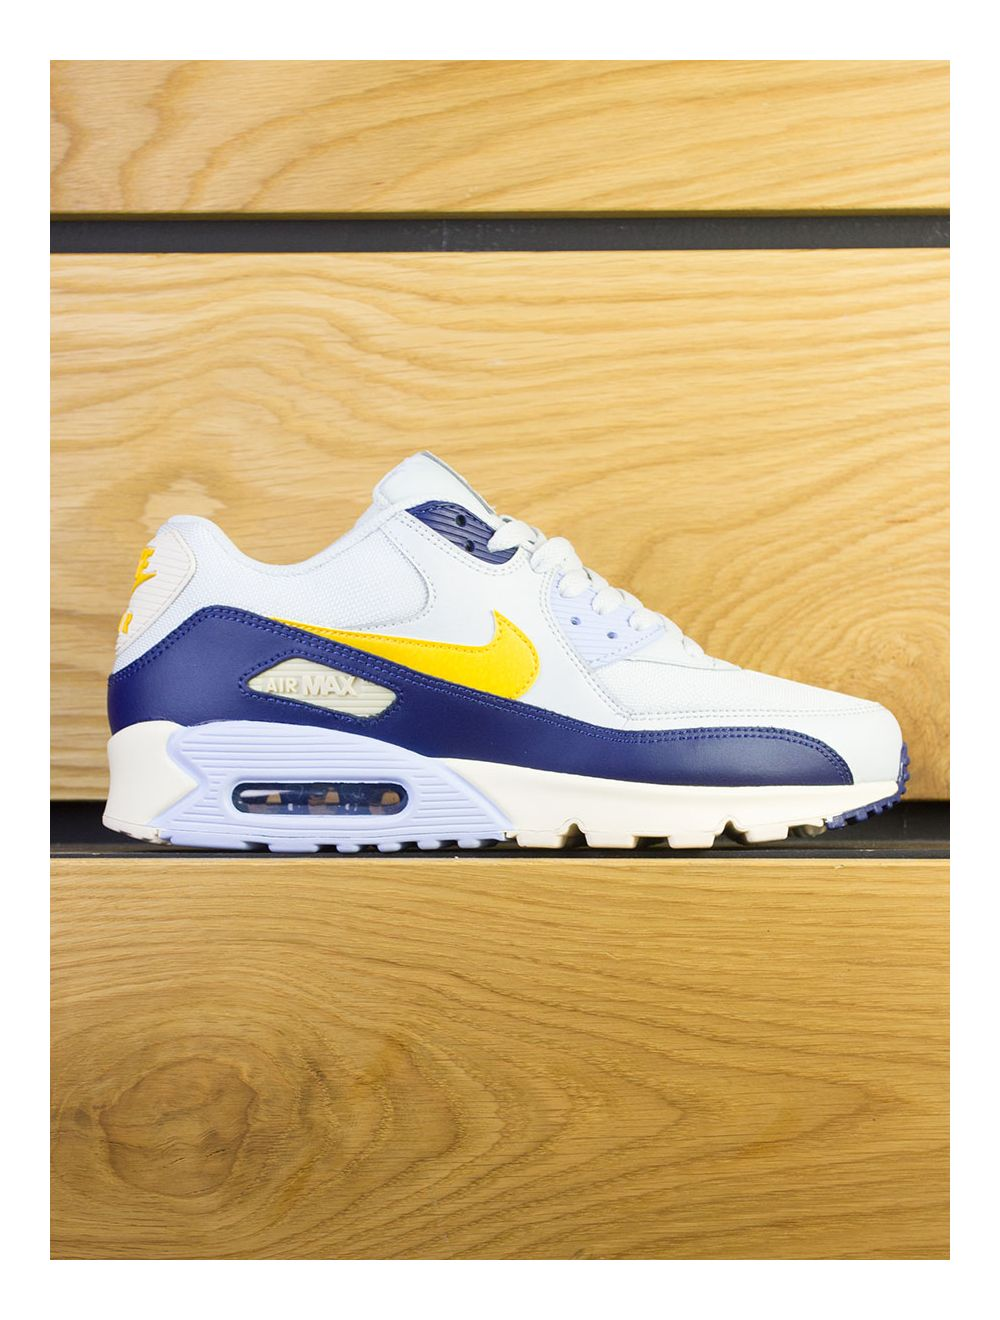 site réputé 2d9d9 3e3eb Nike Air Max 90 Essential - Pure Platinum Yellow Ochre